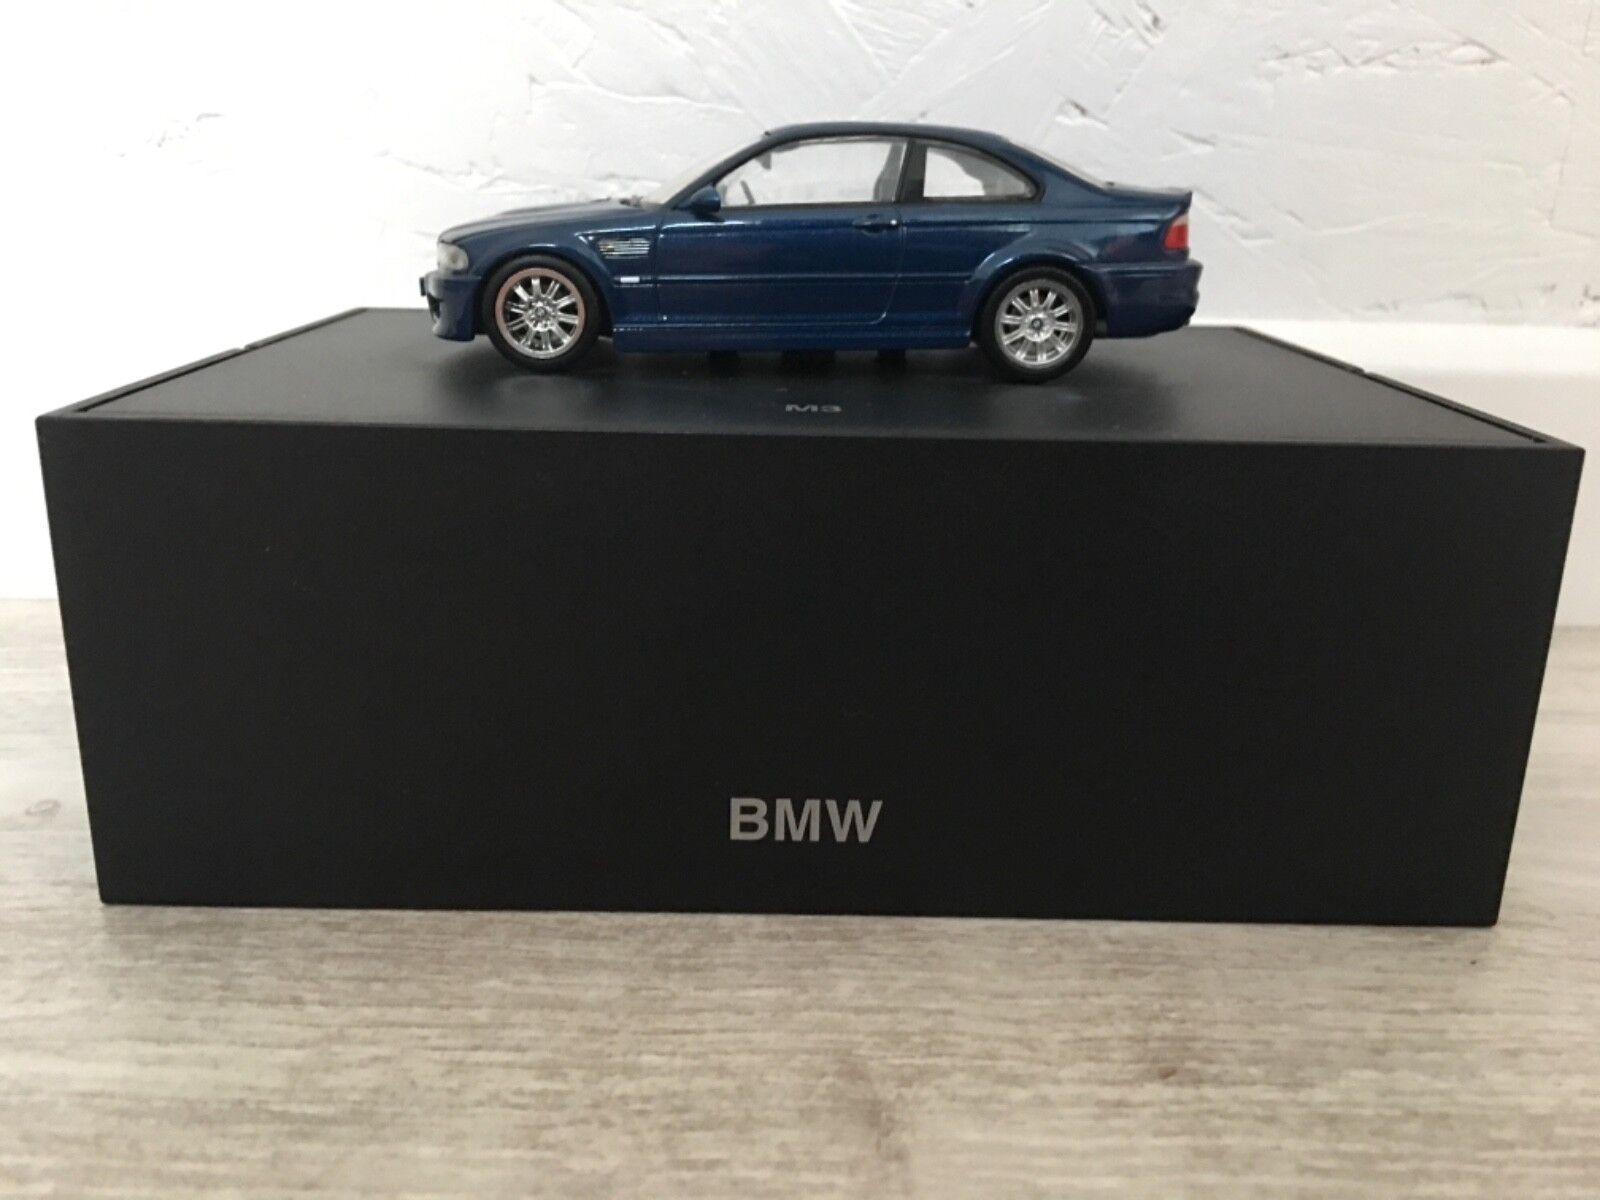 Bmw M3 coupe bleu miniature 1 43 - PROMO